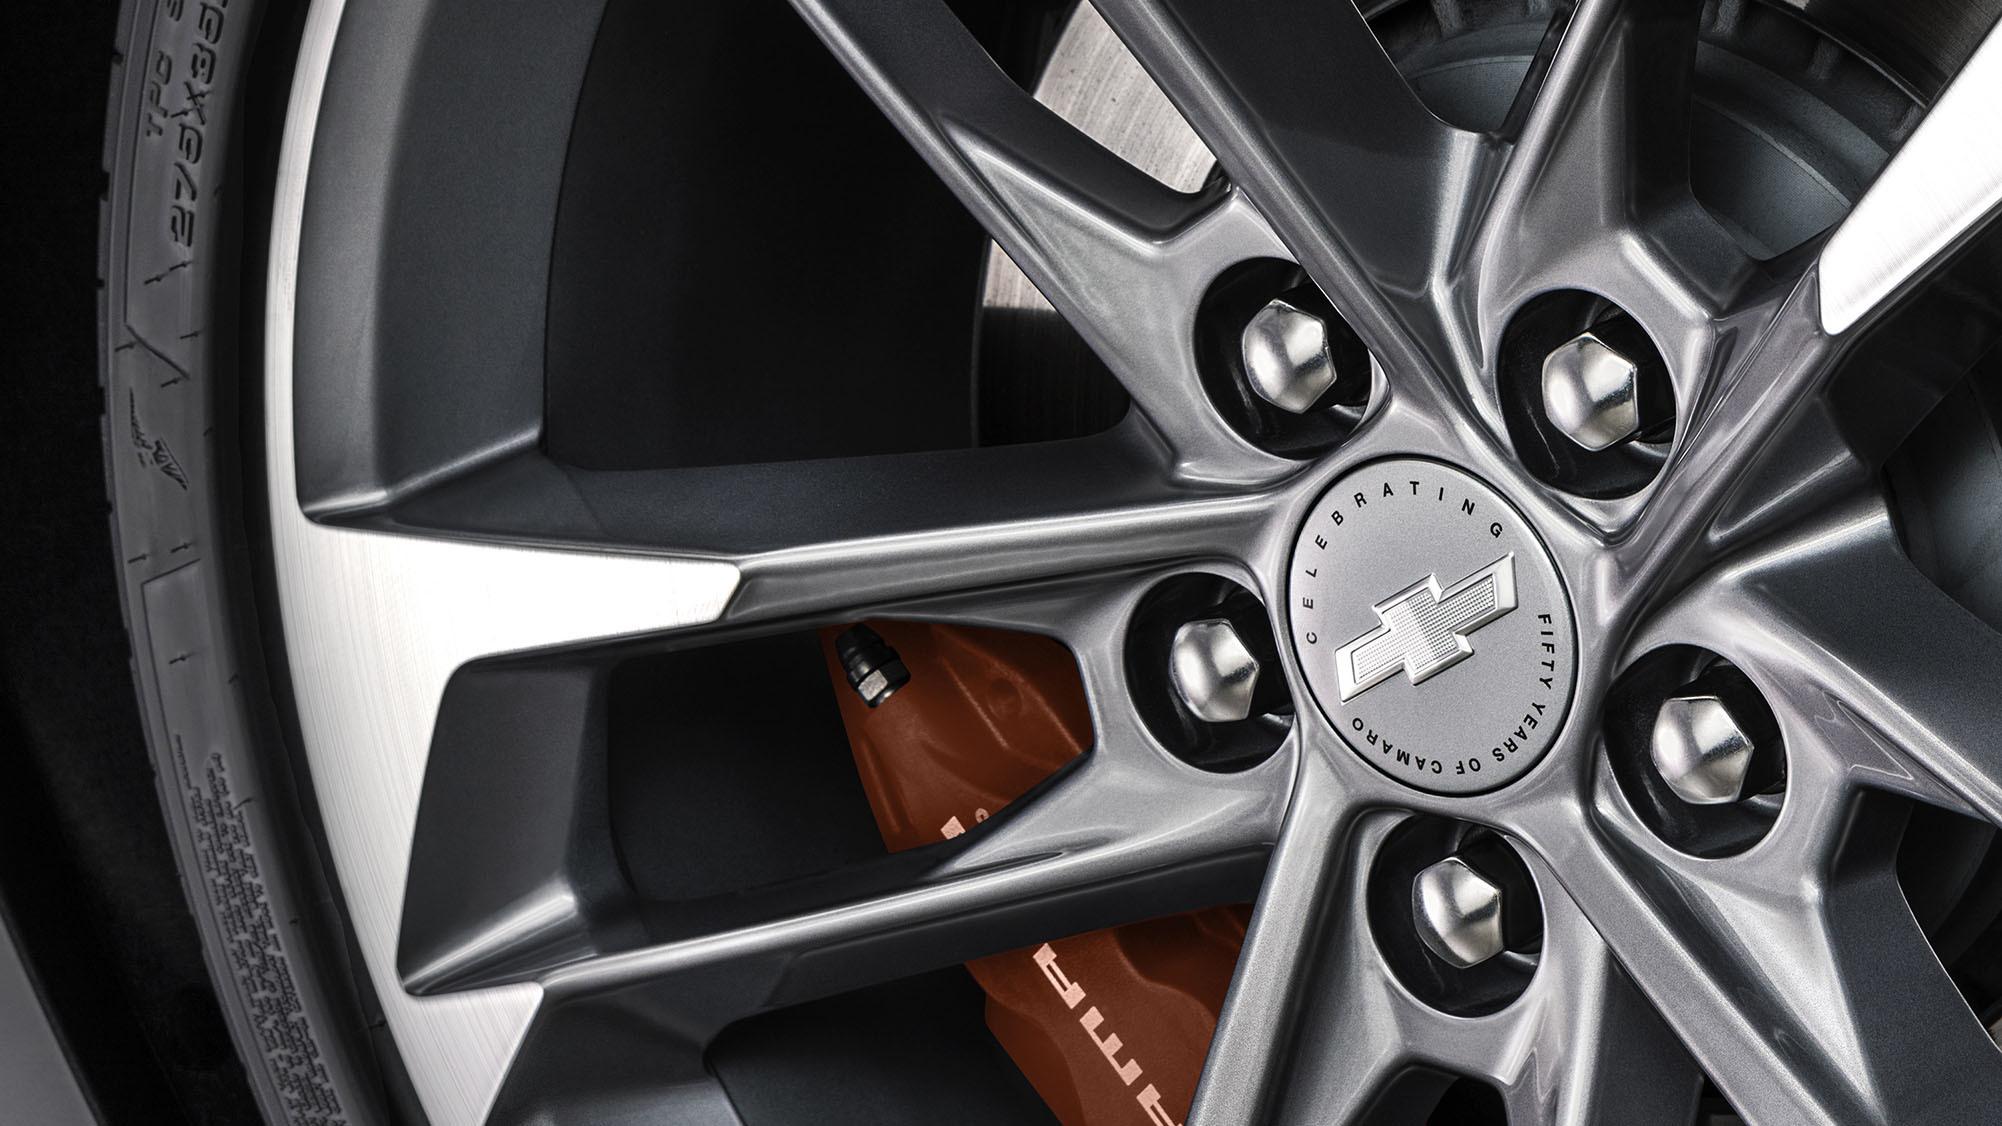 2017 Camaro 50th Anniversary Special Edition